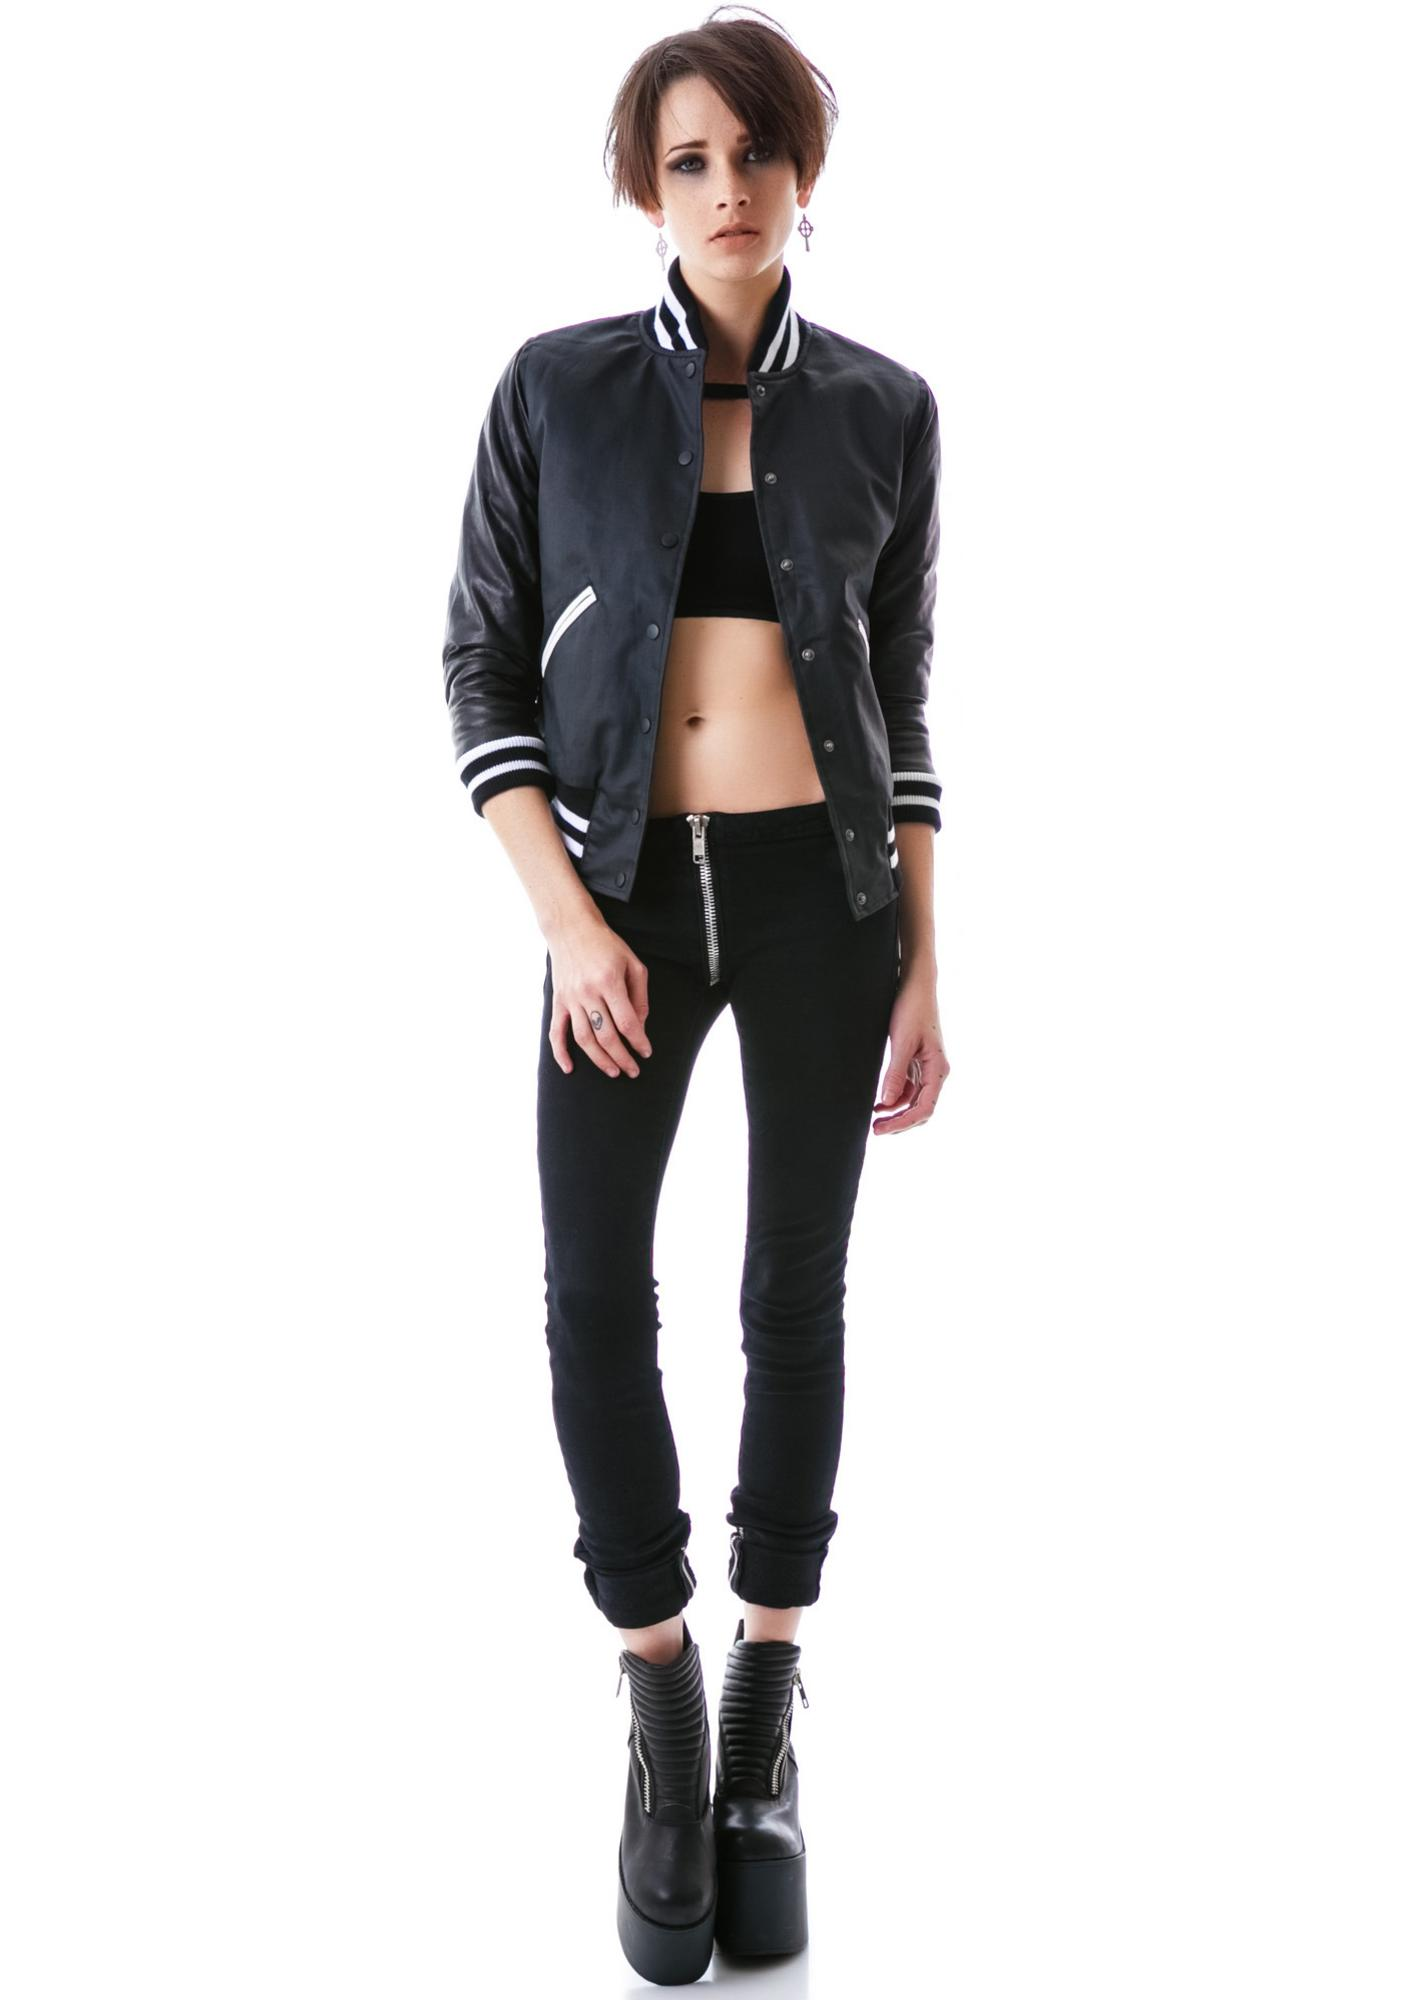 T bird leather jacket